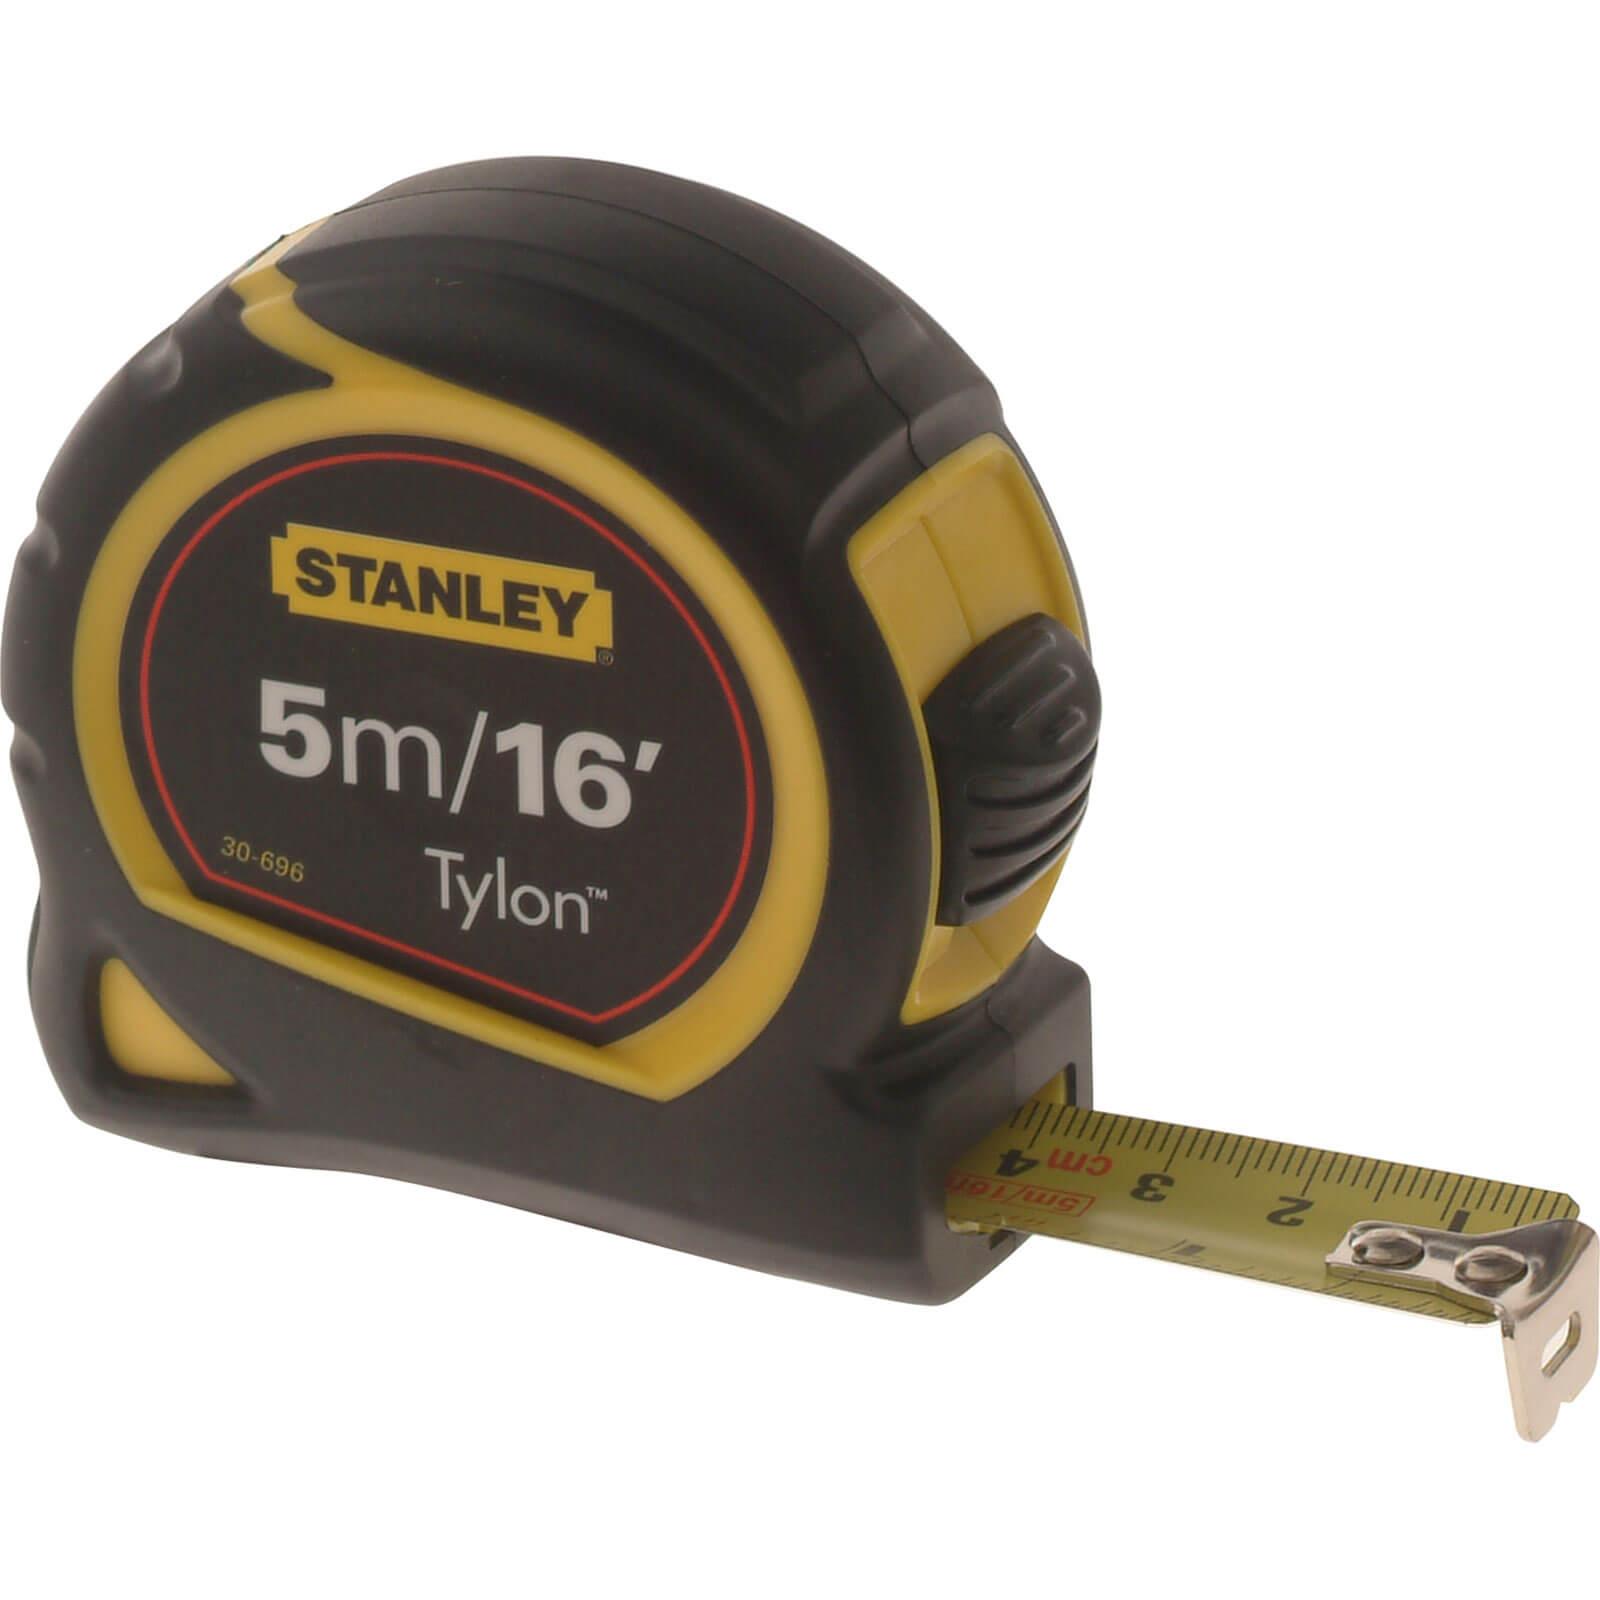 Image of 0-30-696 Pocket Tape 5m / 16ft 19mm Carded